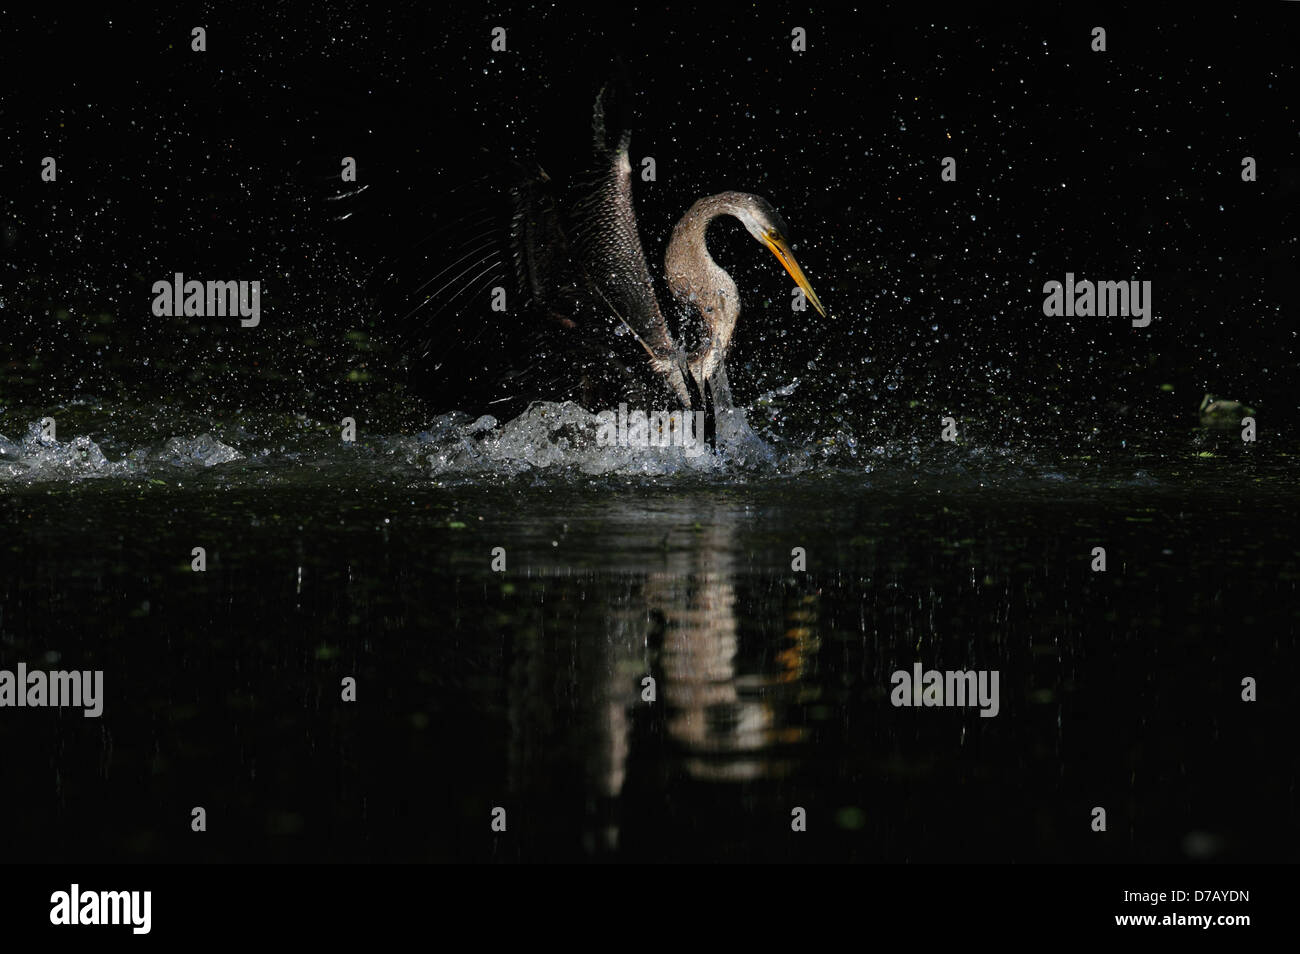 One of the fighting snake bird looks like a Nature's Swarovski  gem - Stock Image